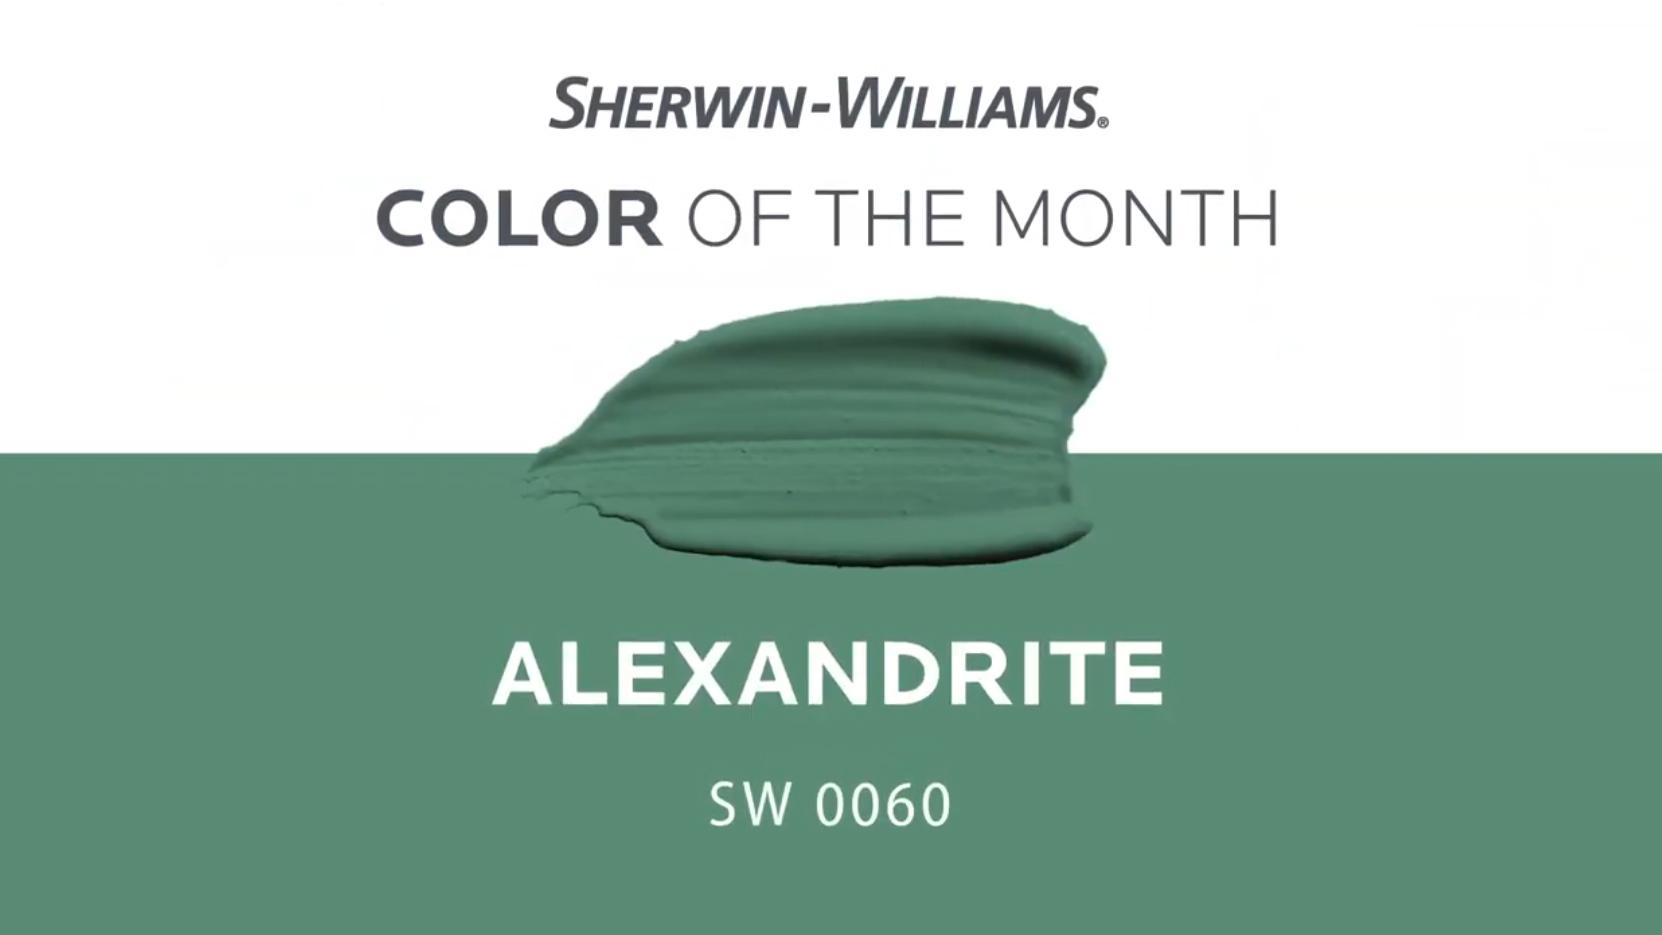 SW 0060 Alexandrite